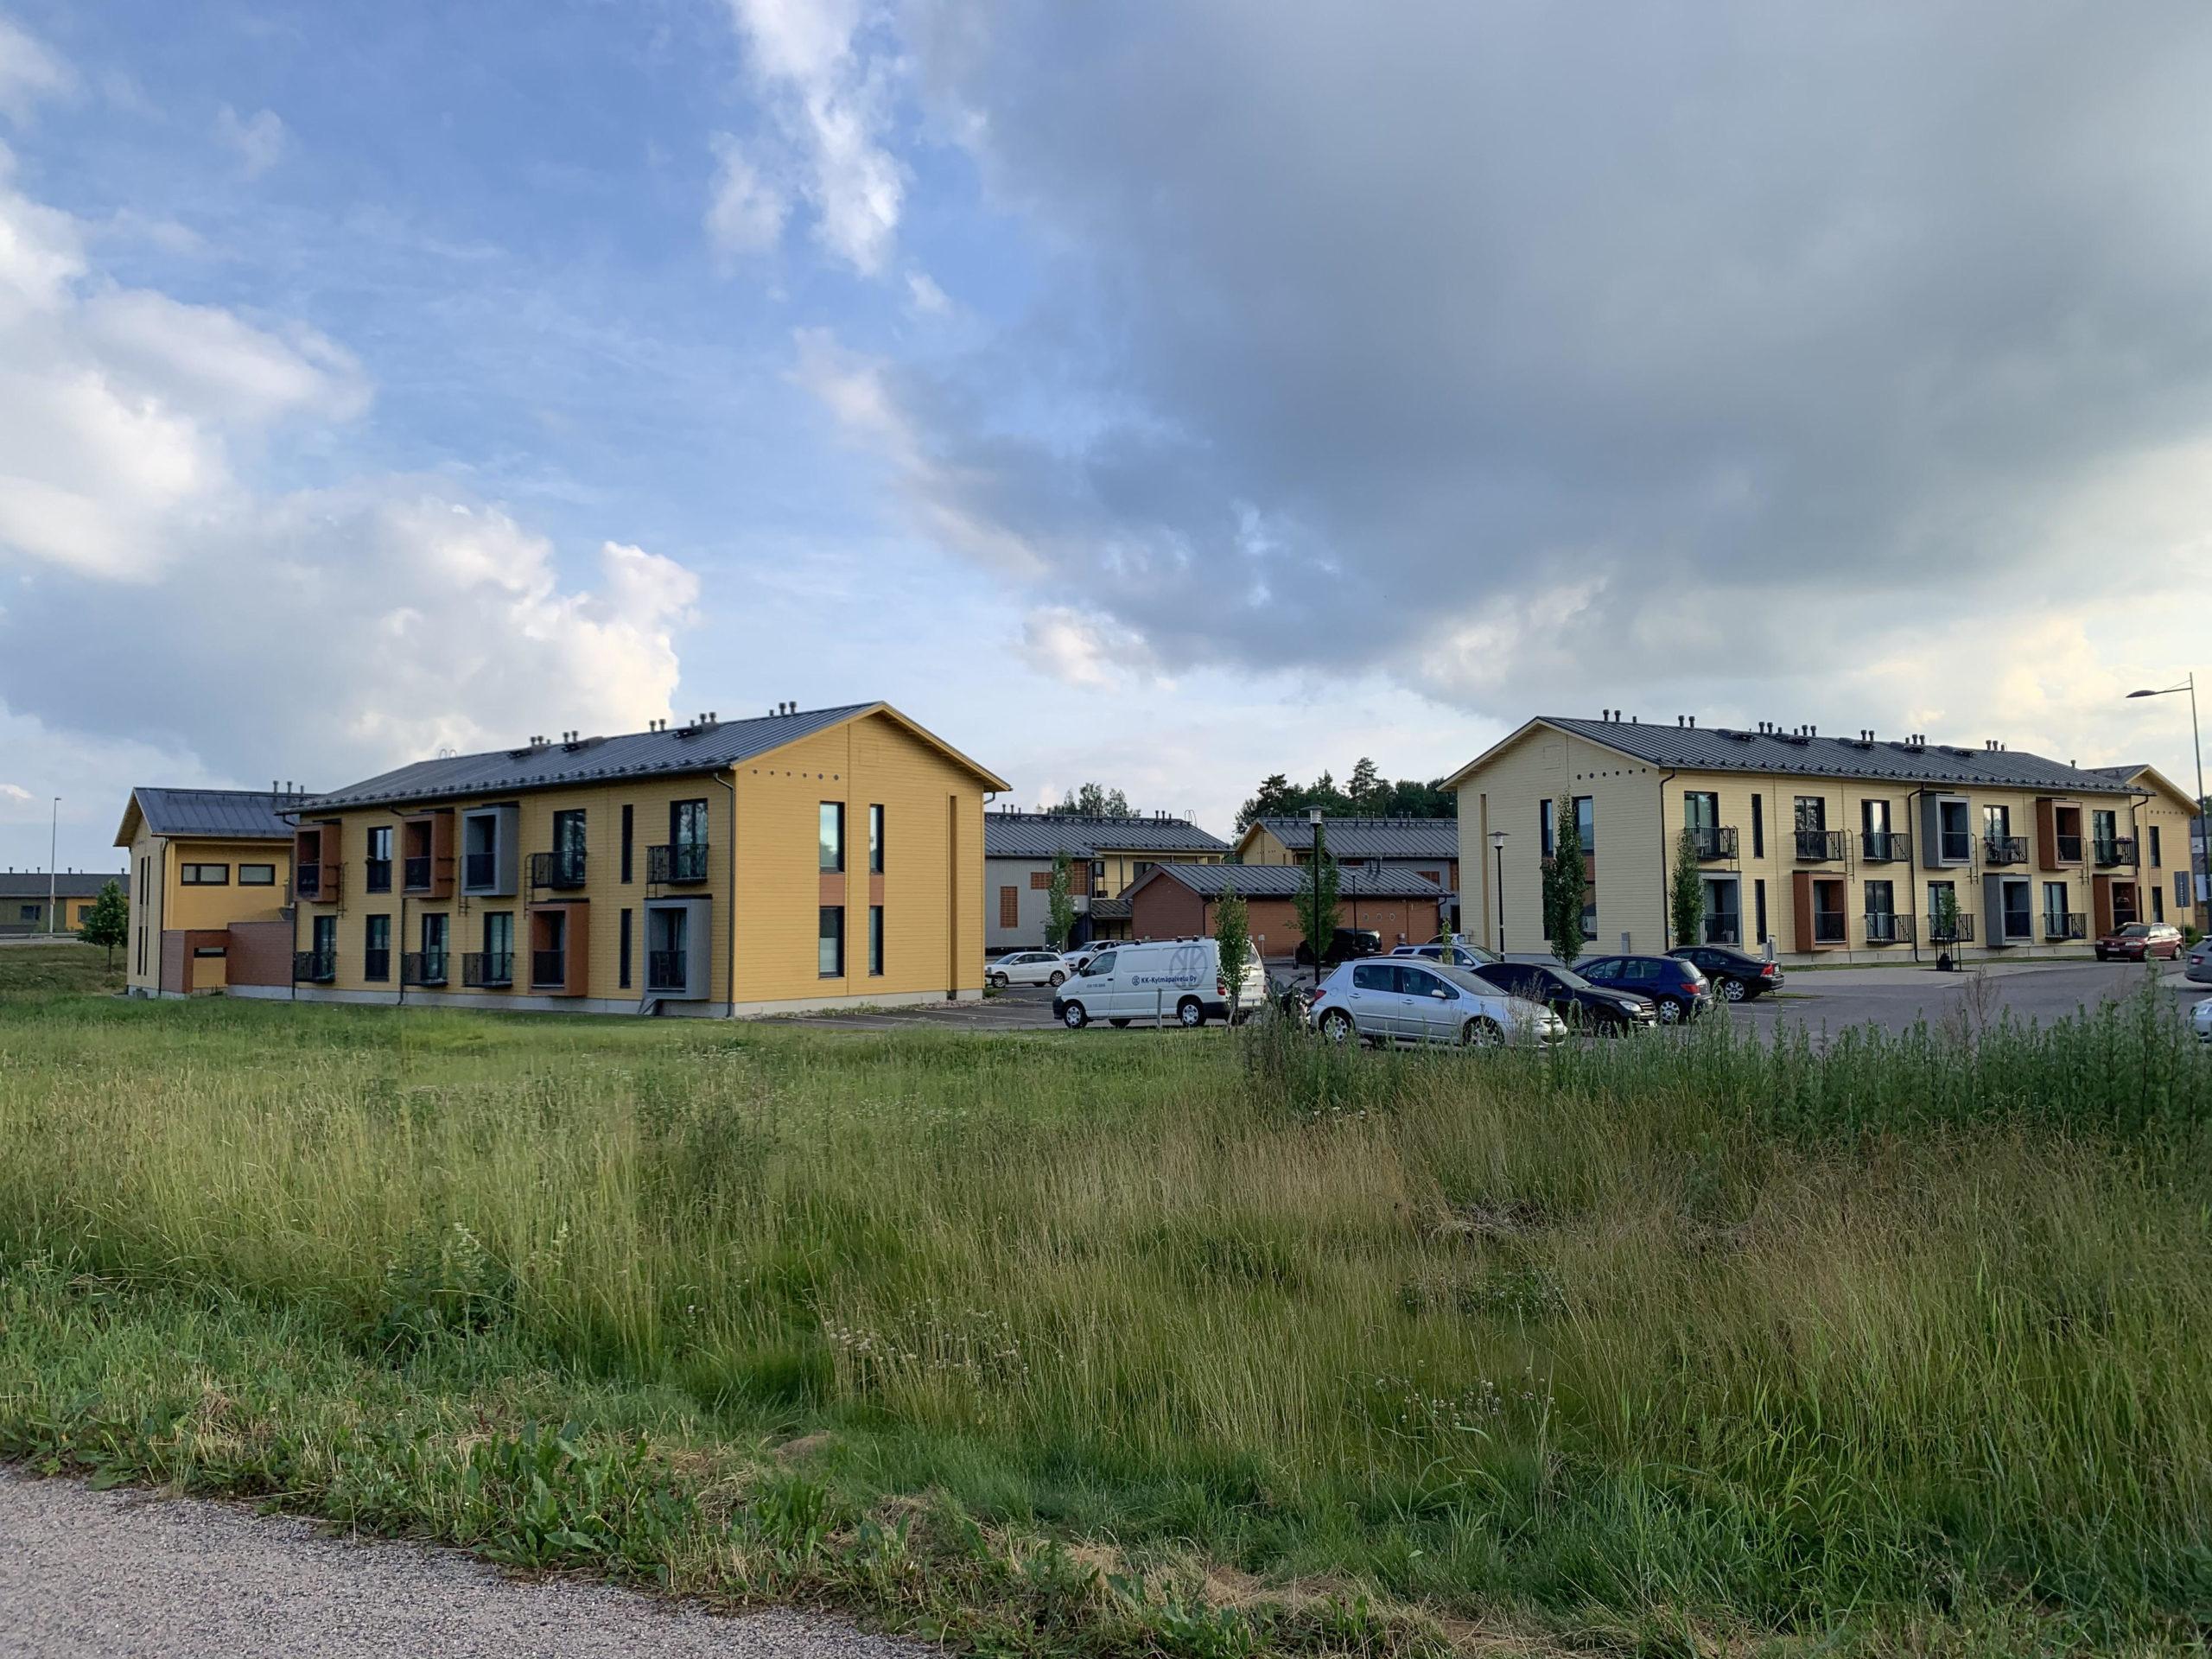 Airbnb-asunto Lepolassa. © Moona Laakso